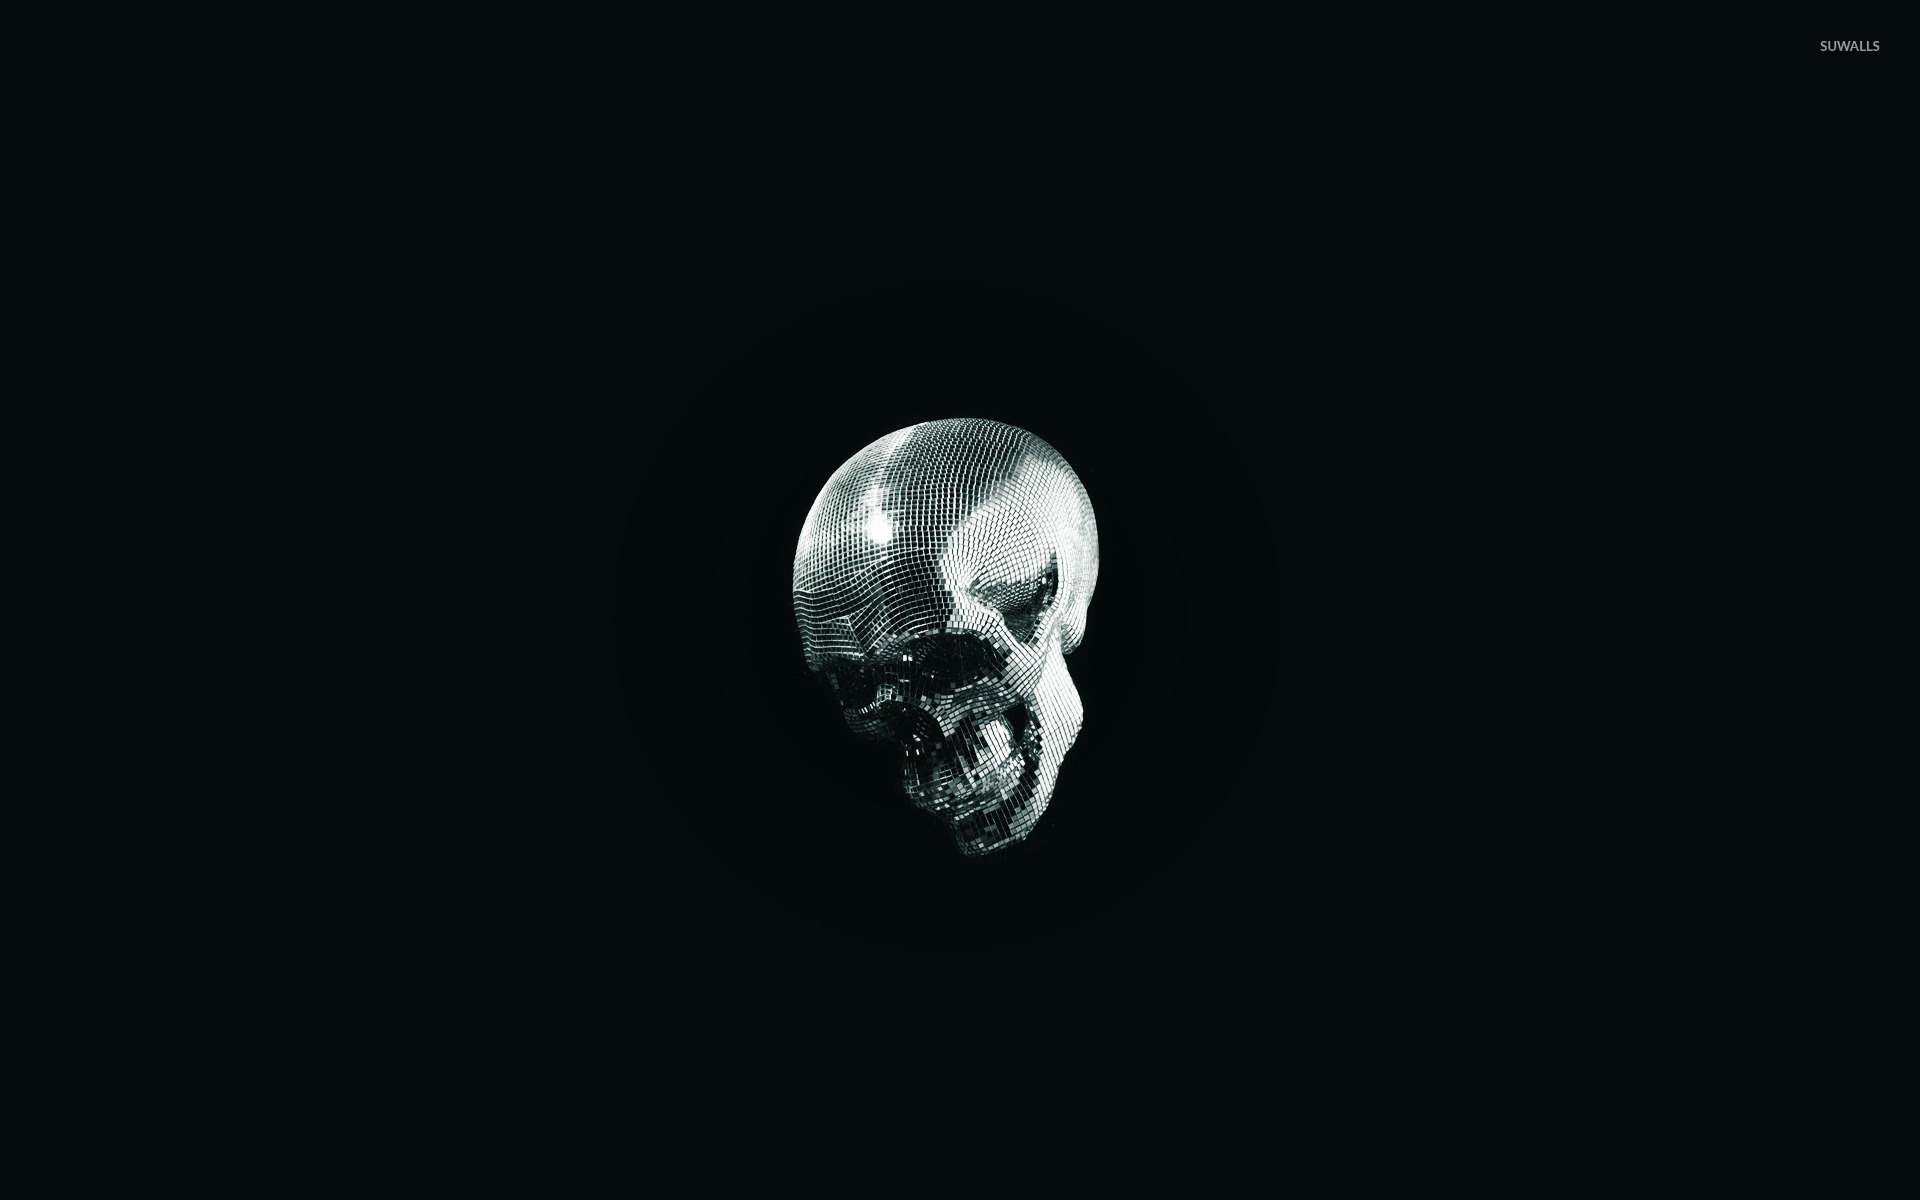 I live inside your face skull wallpaper - Funny wallpapers